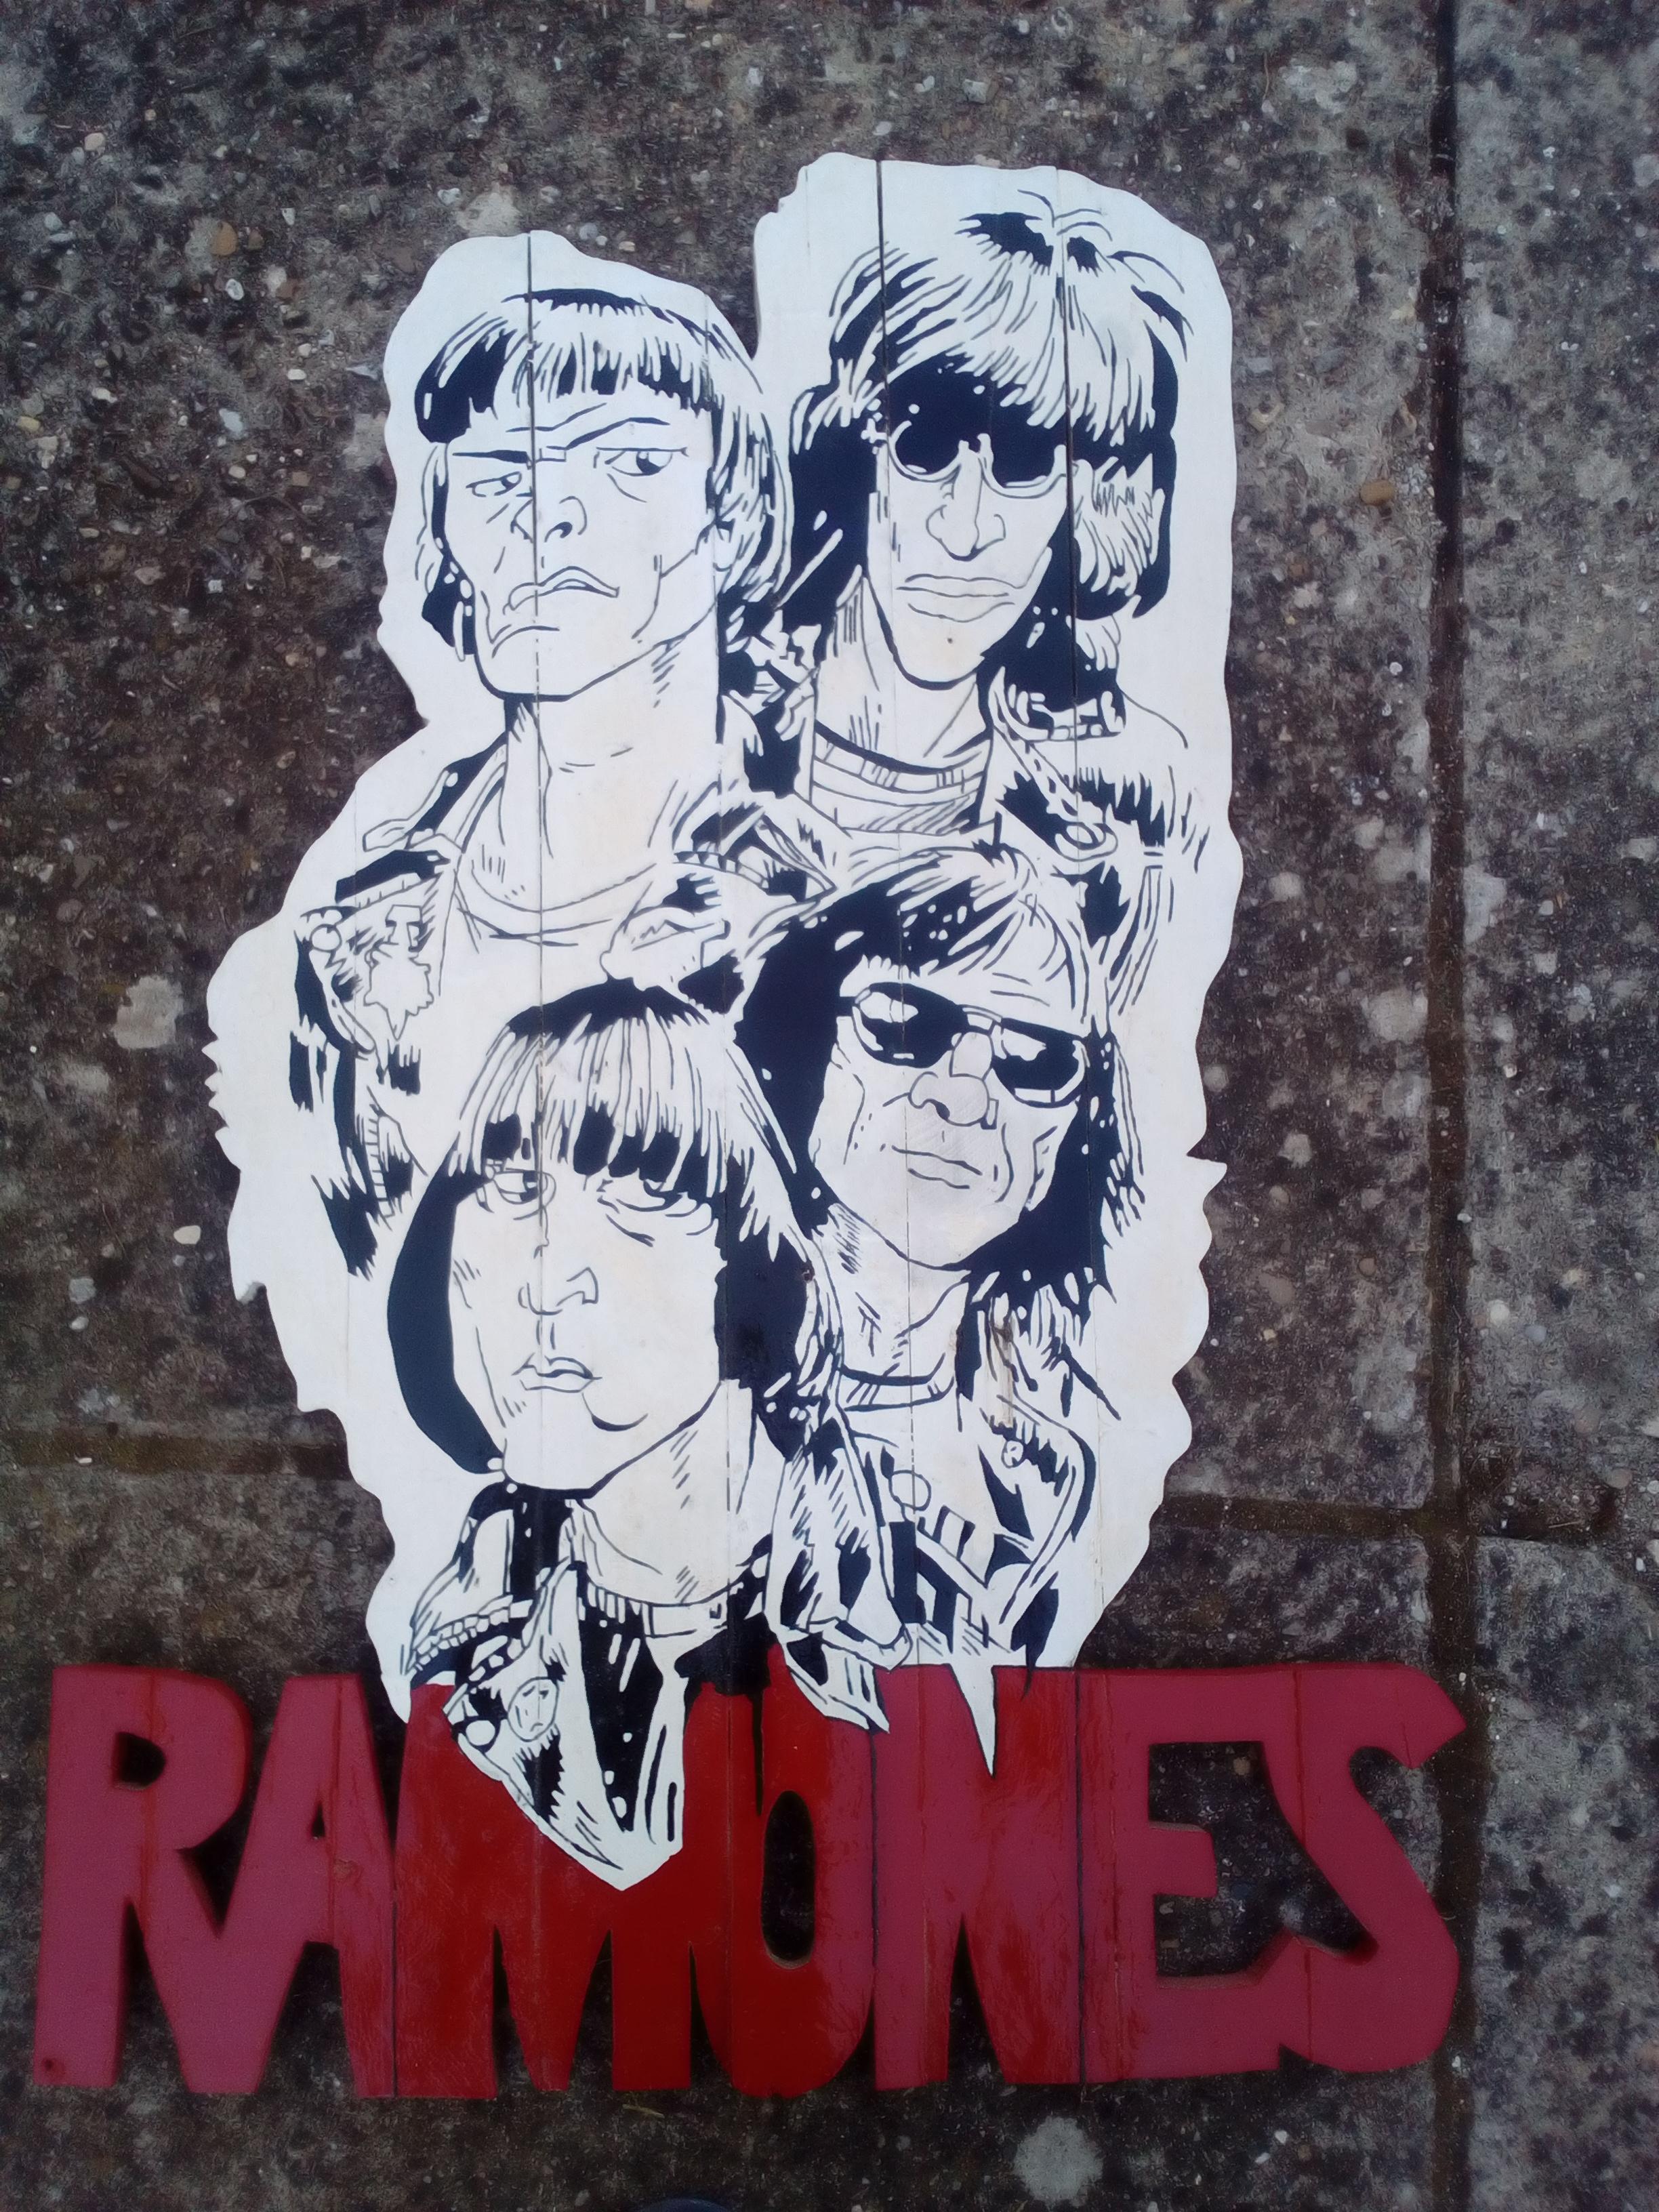 Homenaje a Ramones